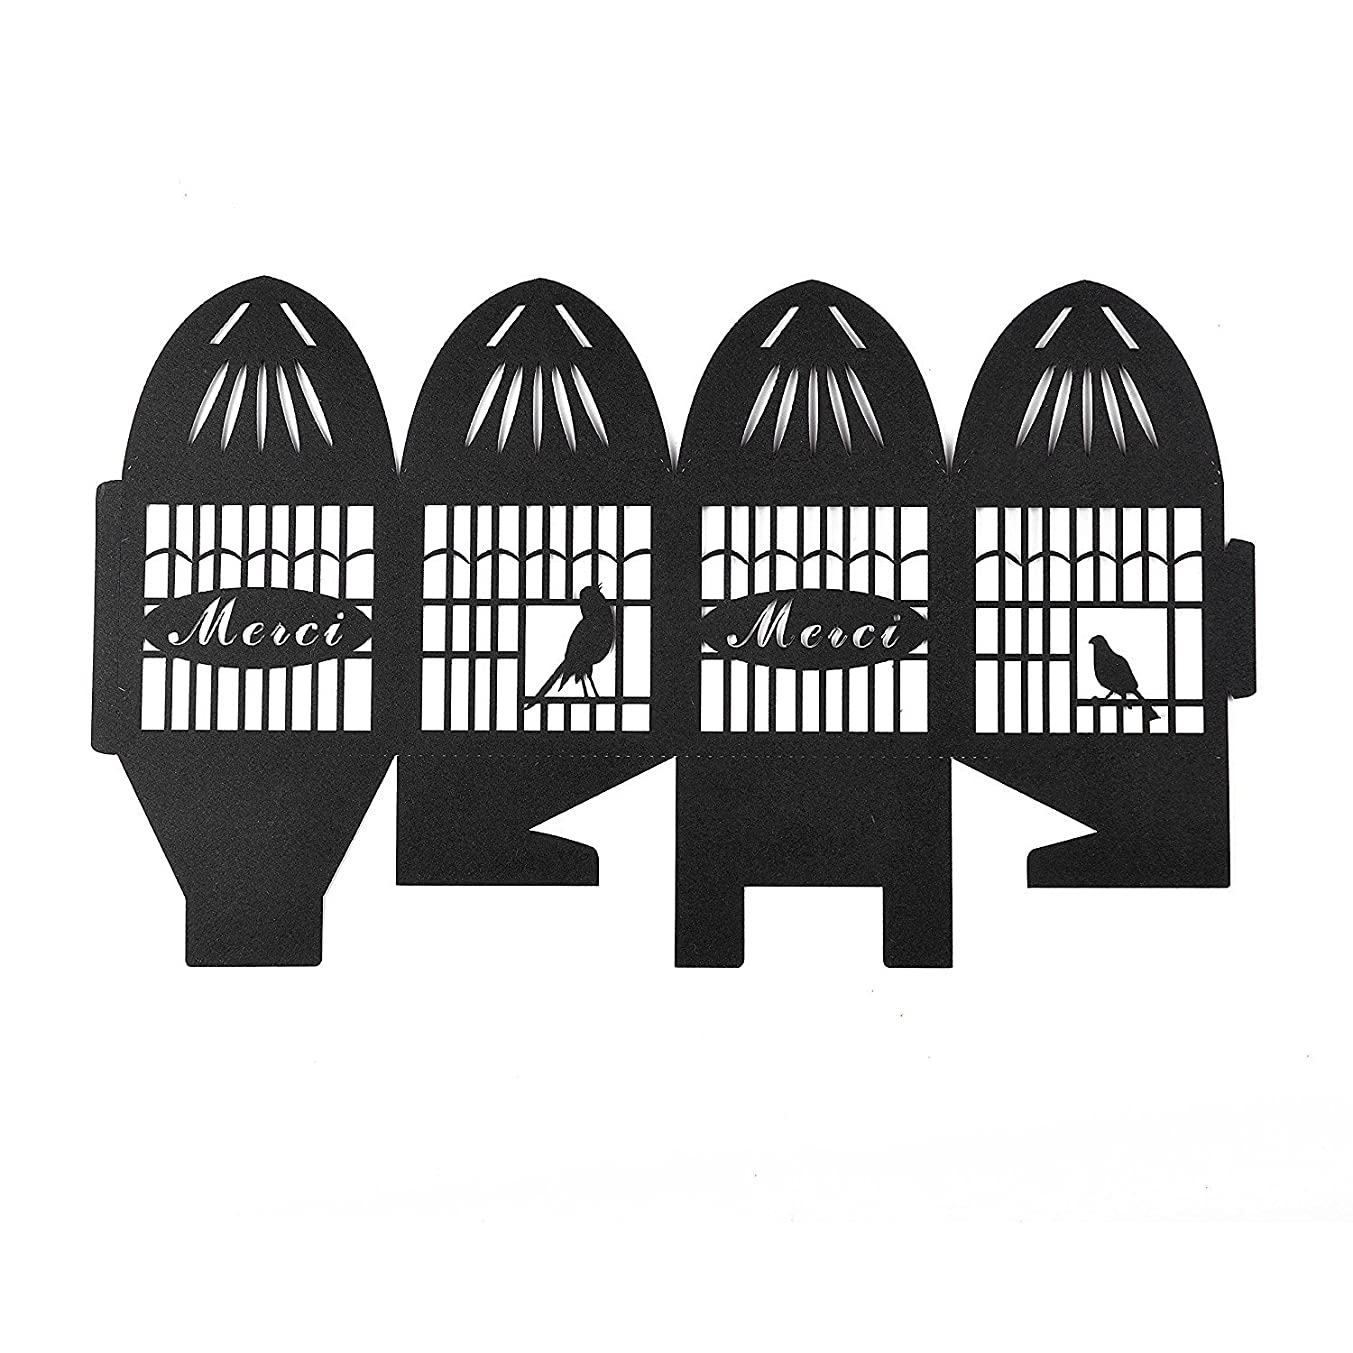 Paris Themed Black Birdcage